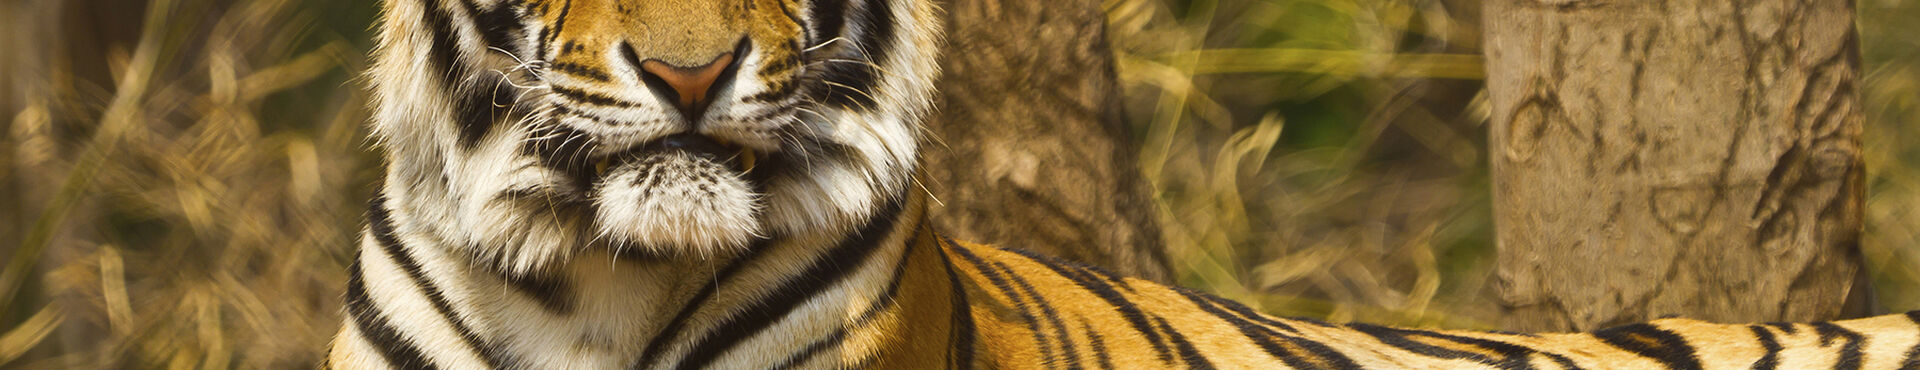 Banner - Global Federation of Animal Sanctuaries